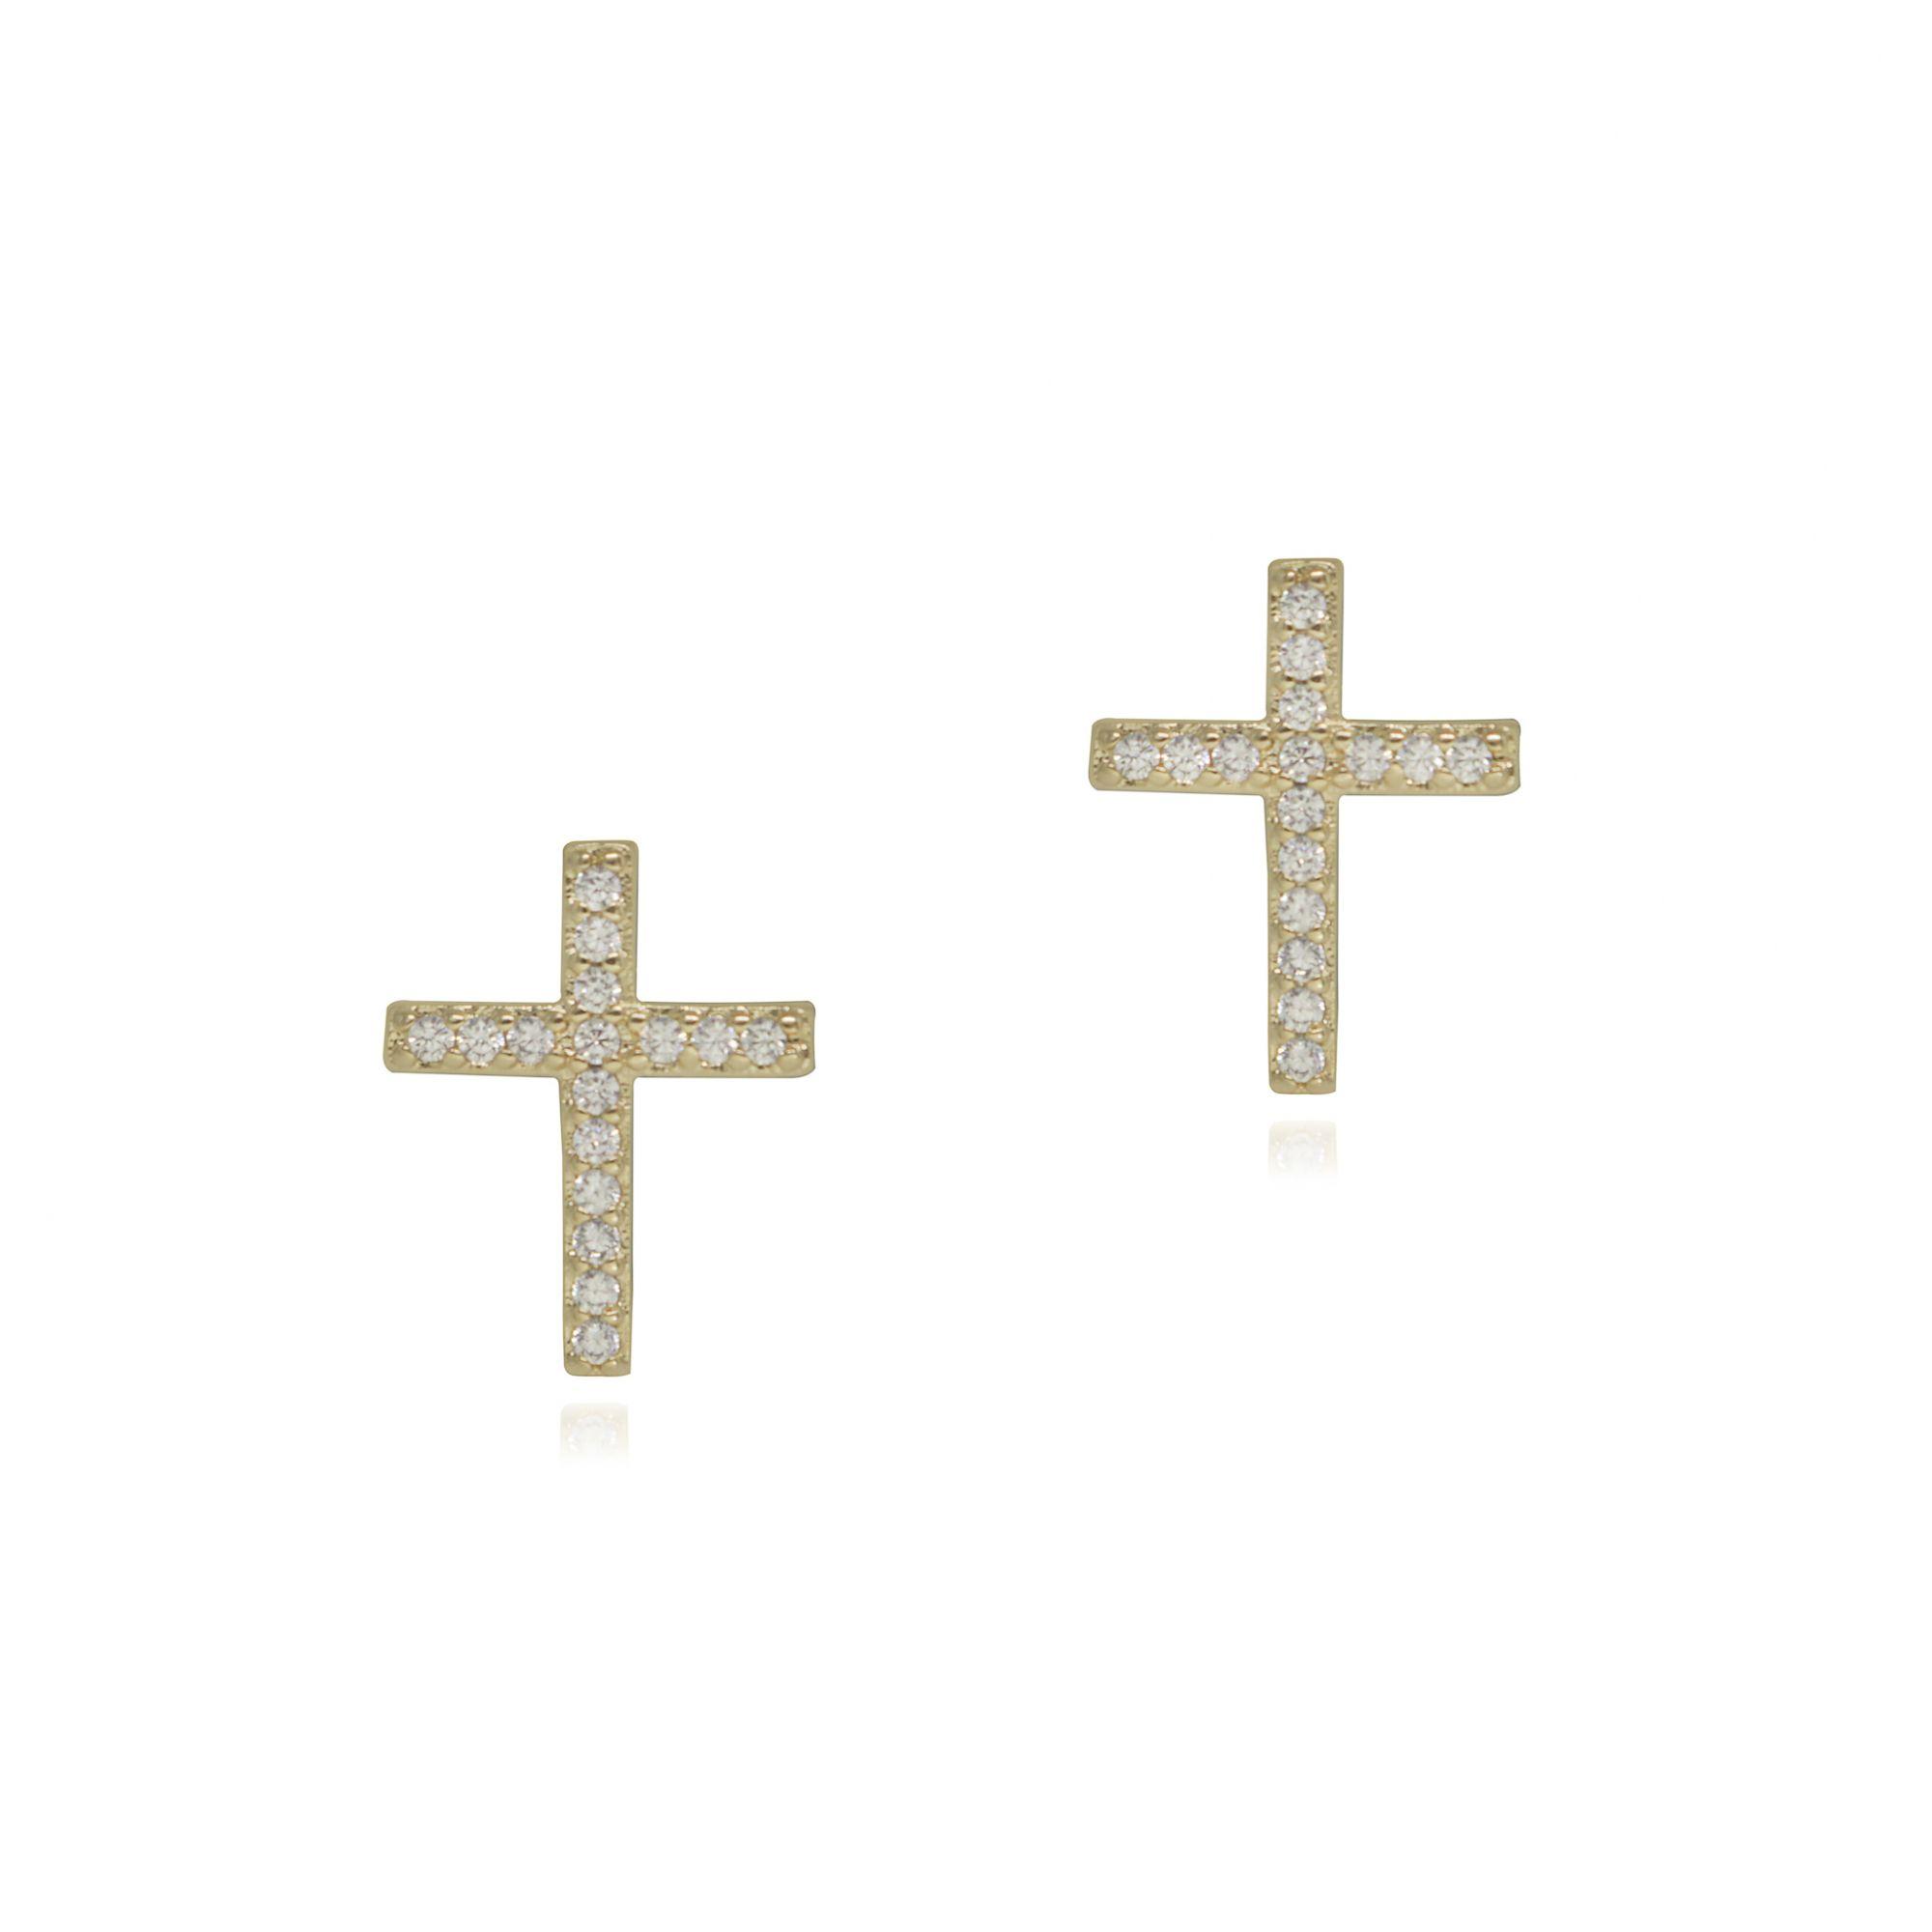 Brinco folheado semijoia Crucifixo cravejado em zirconia